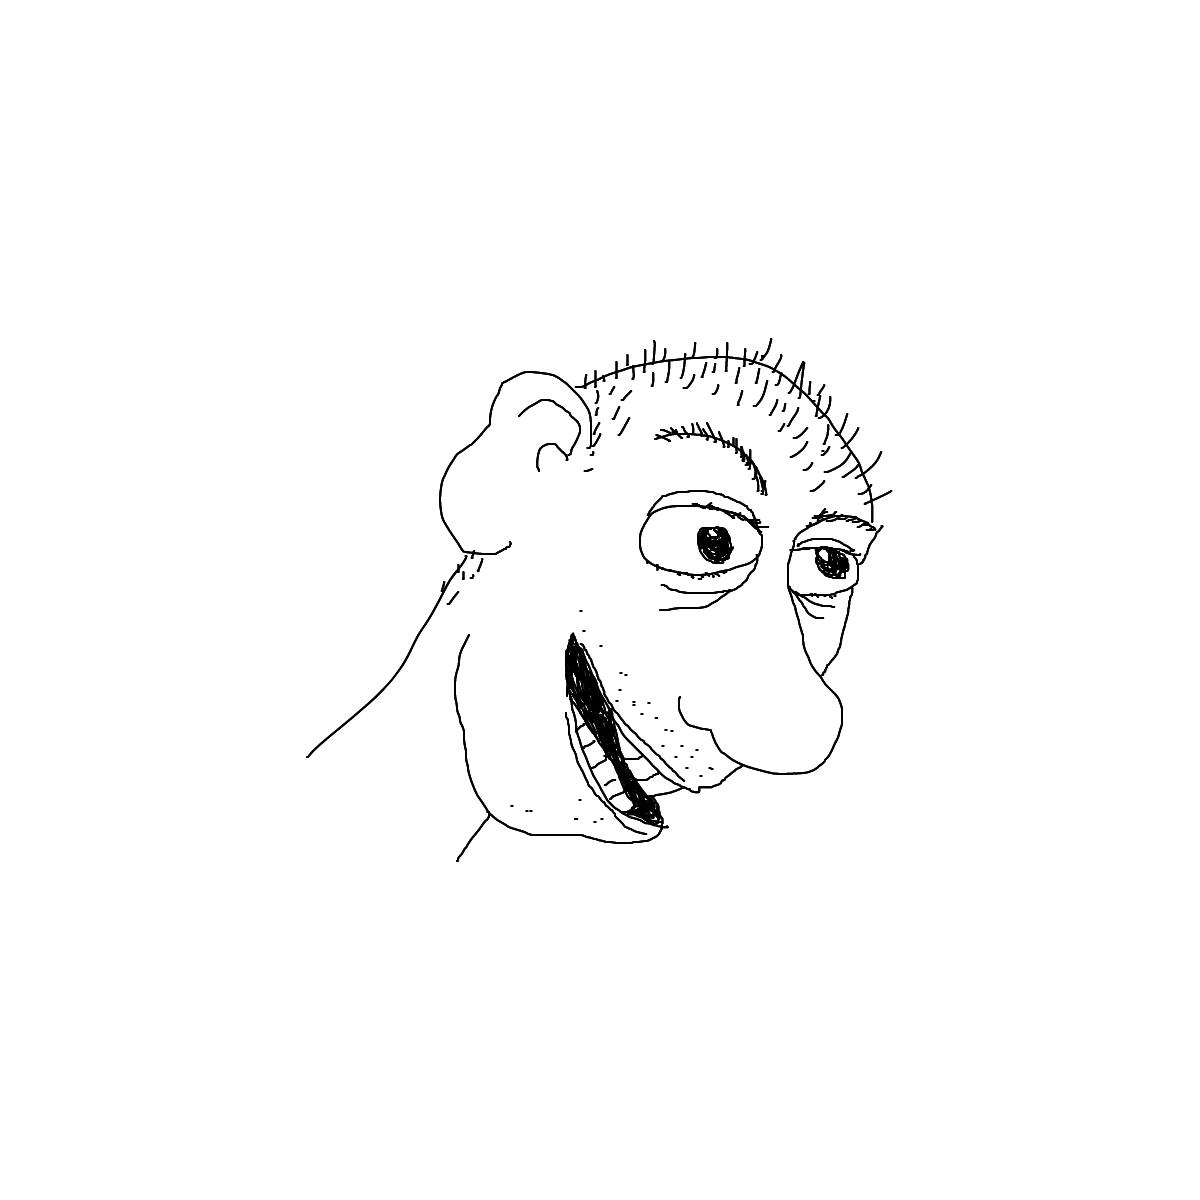 BAAAM drawing#24577 lat:59.9331245422363300lng: 30.3576221466064450